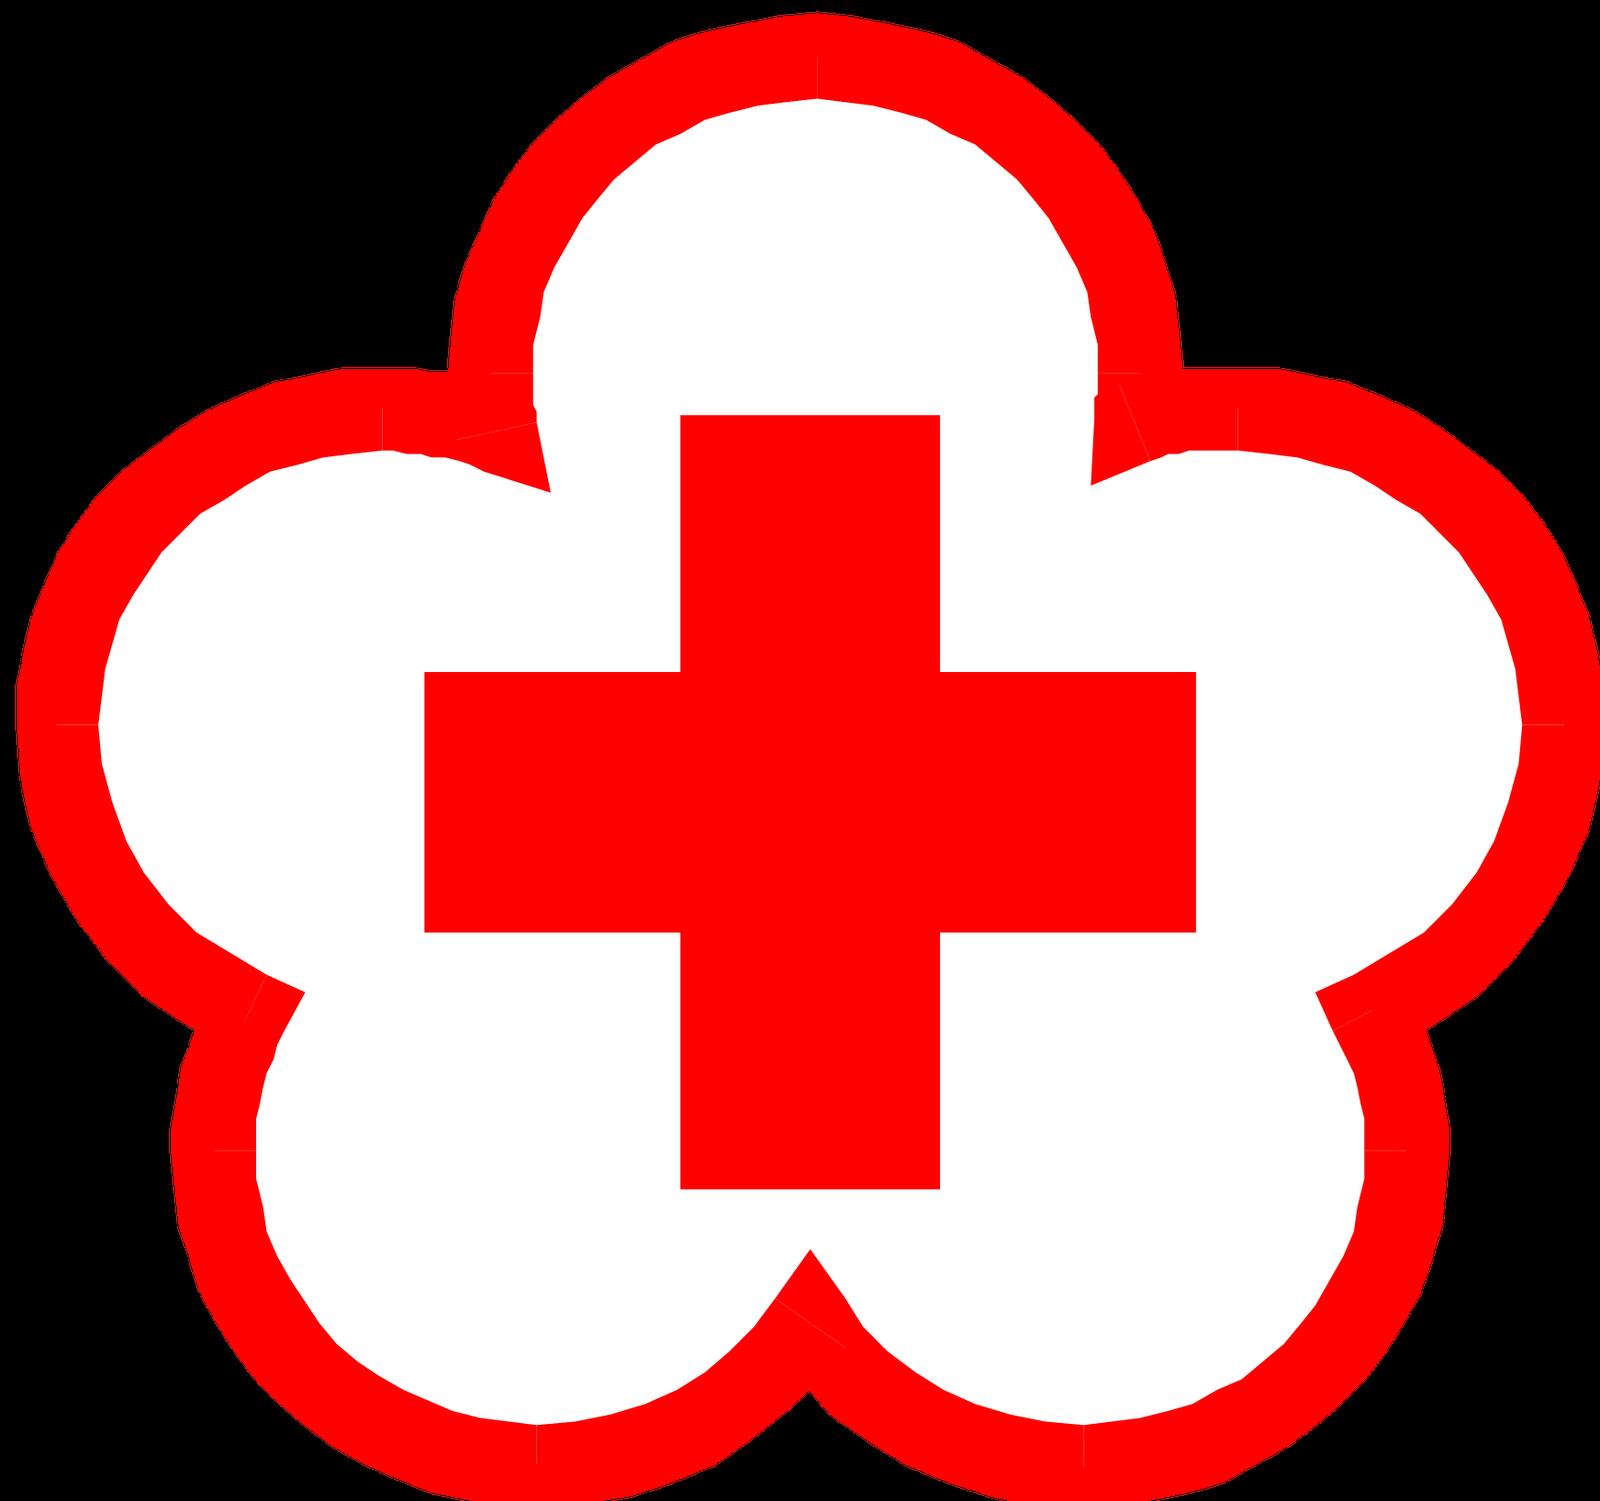 Logo palang merah indonesia png 7 » PNG Image.